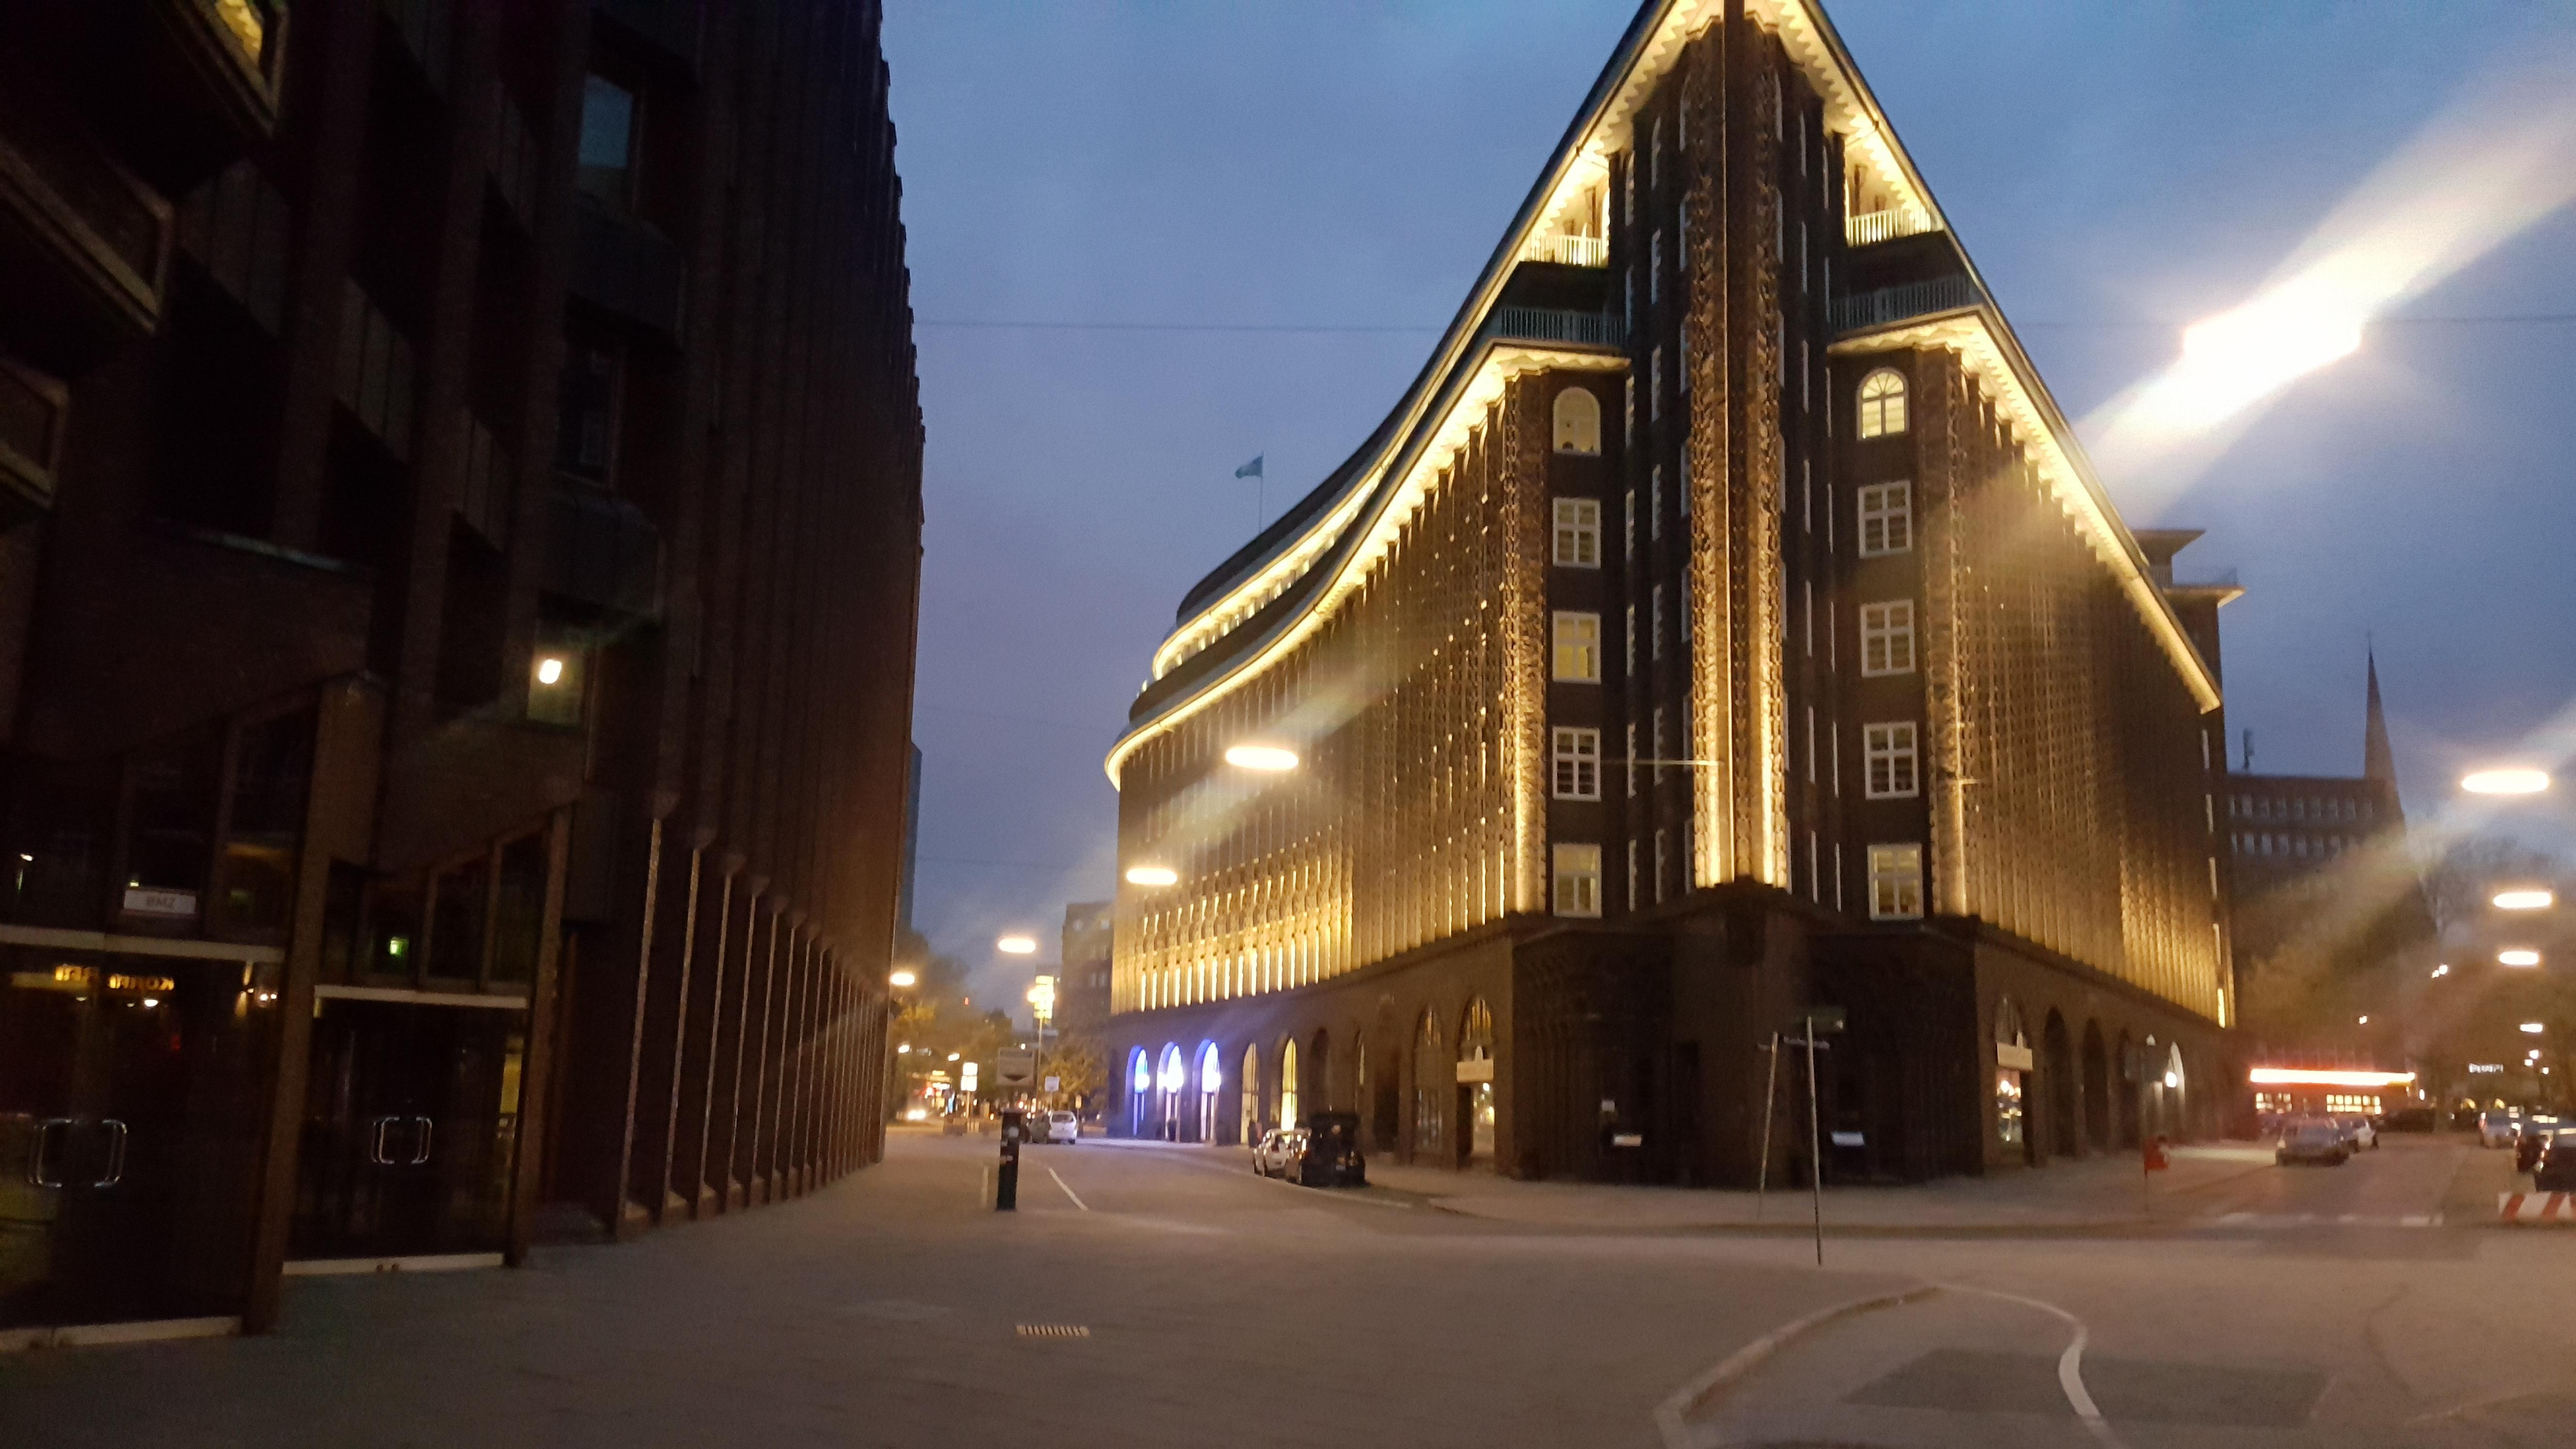 Burchardstraße - Street Parking in Hamburg | ParkMe